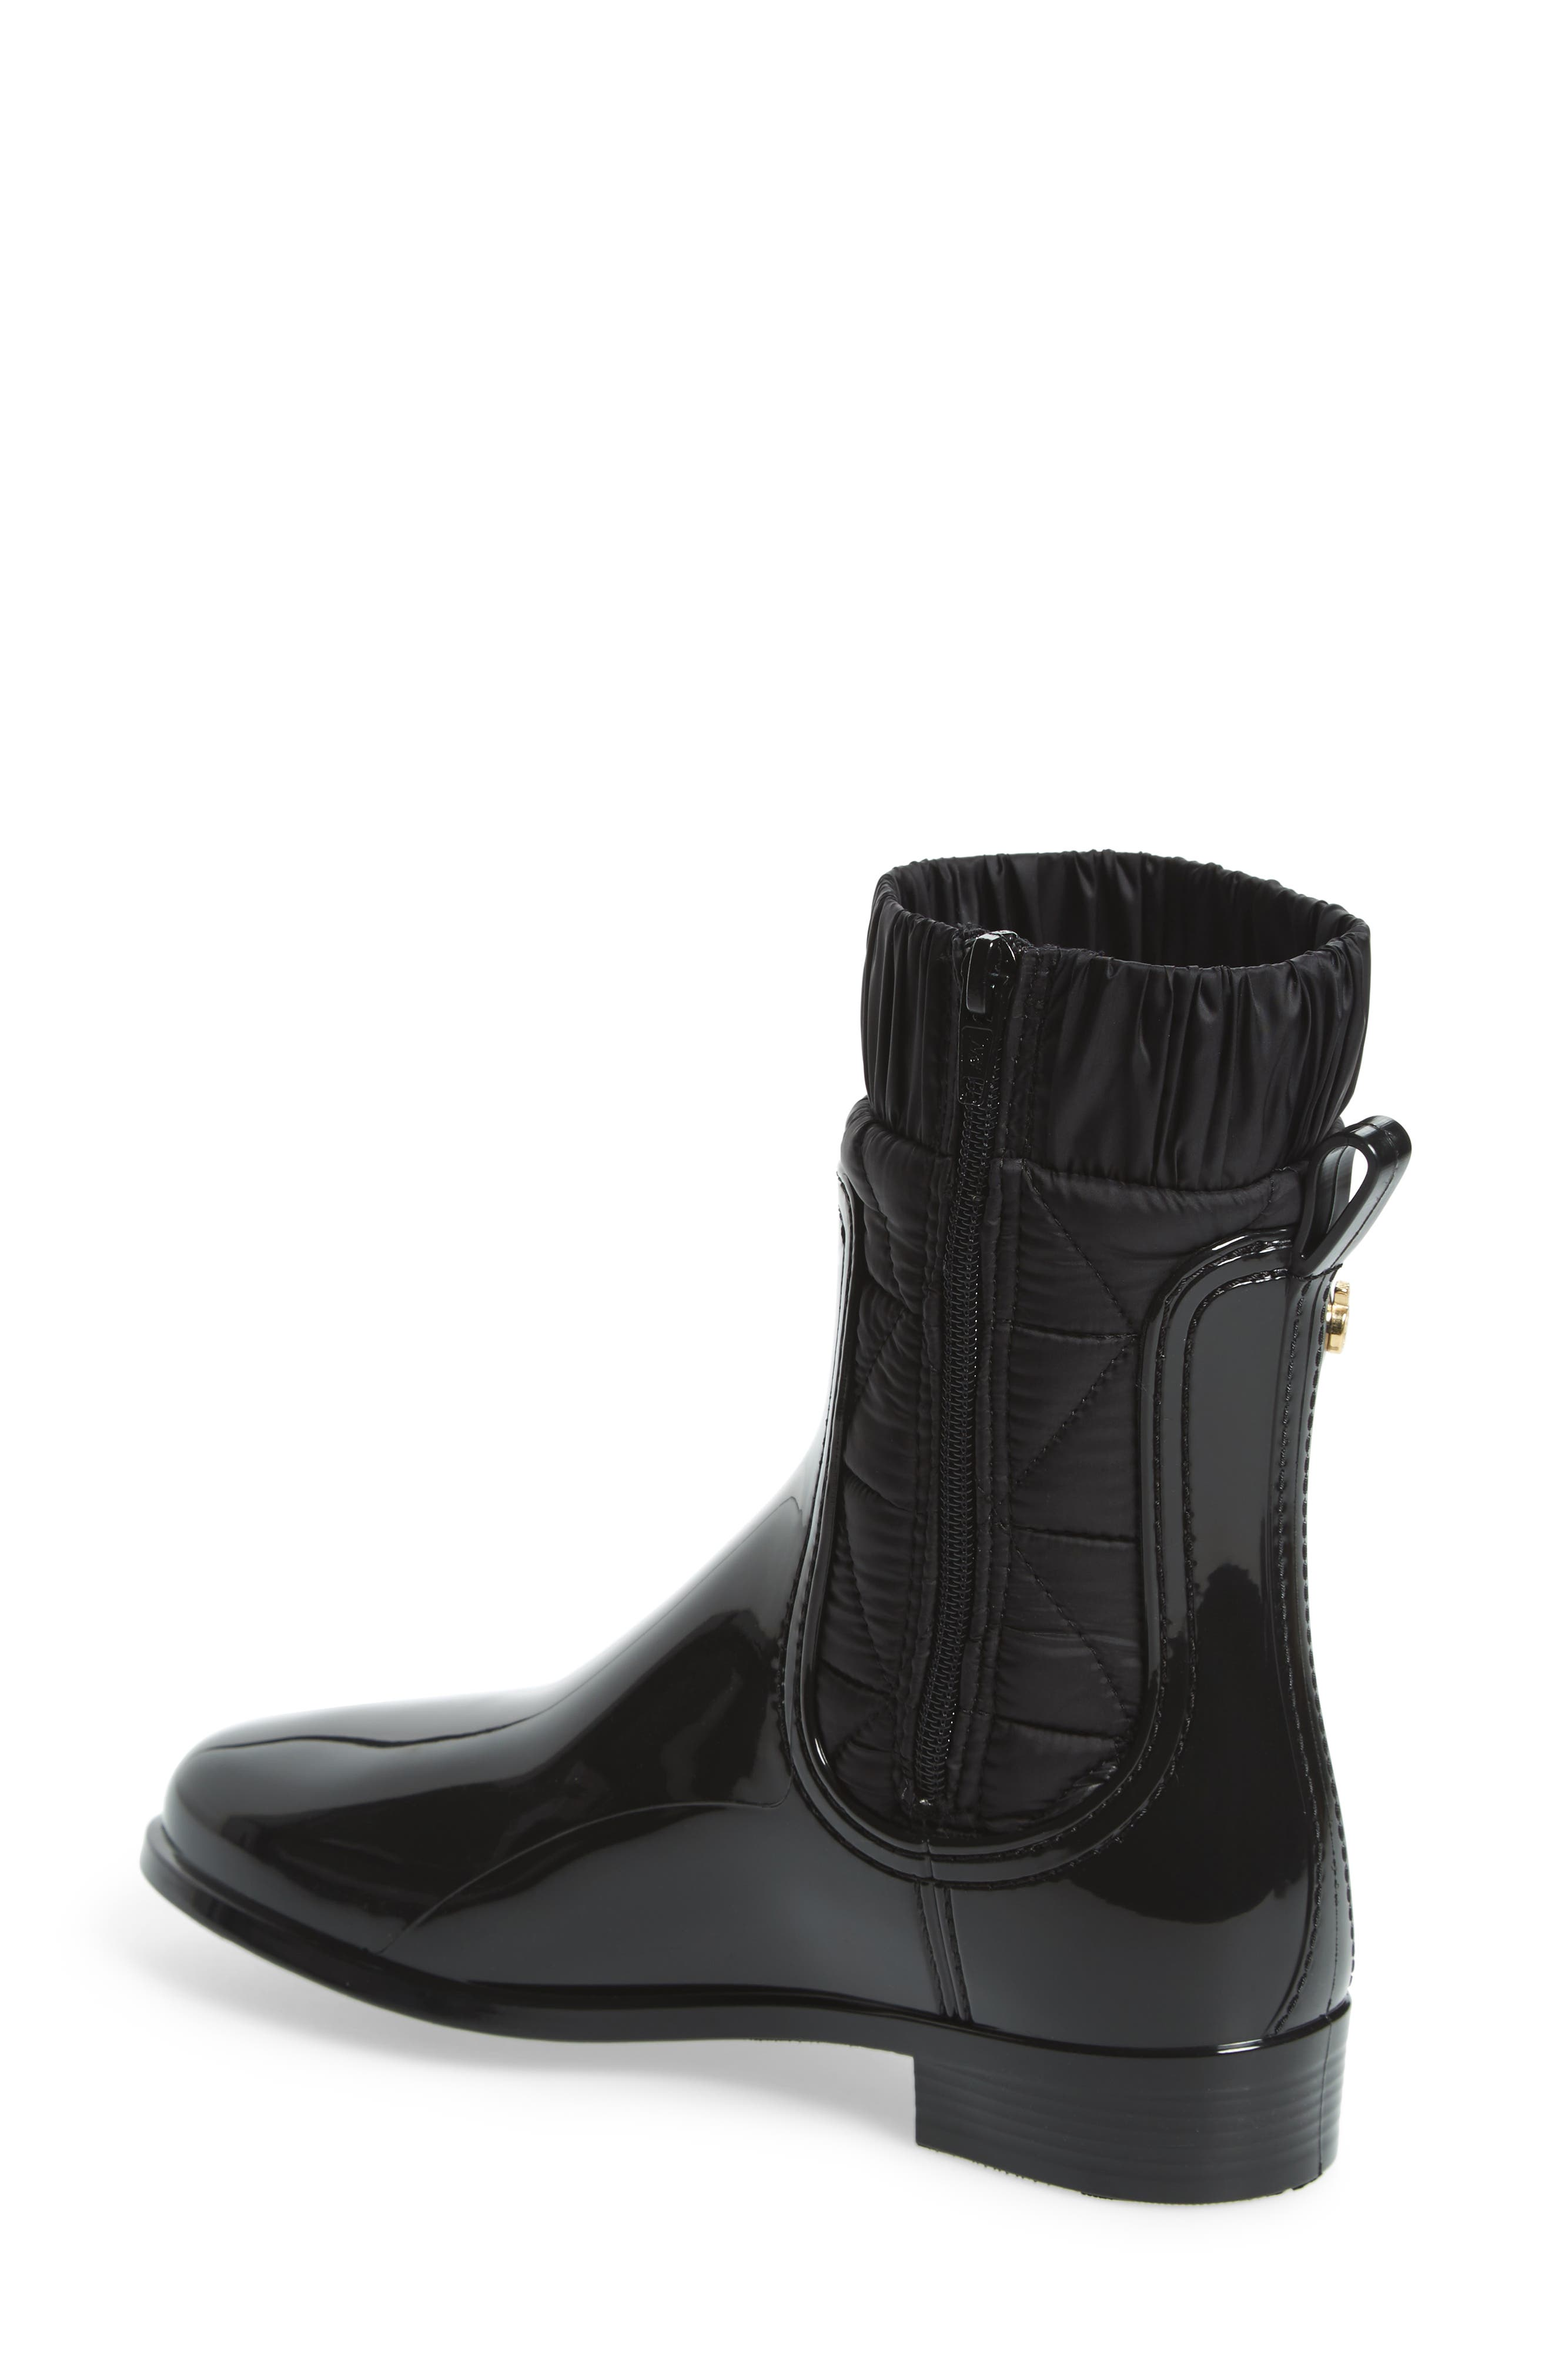 Adele Waterproof Boot,                             Alternate thumbnail 2, color,                             BLACK GLOSS